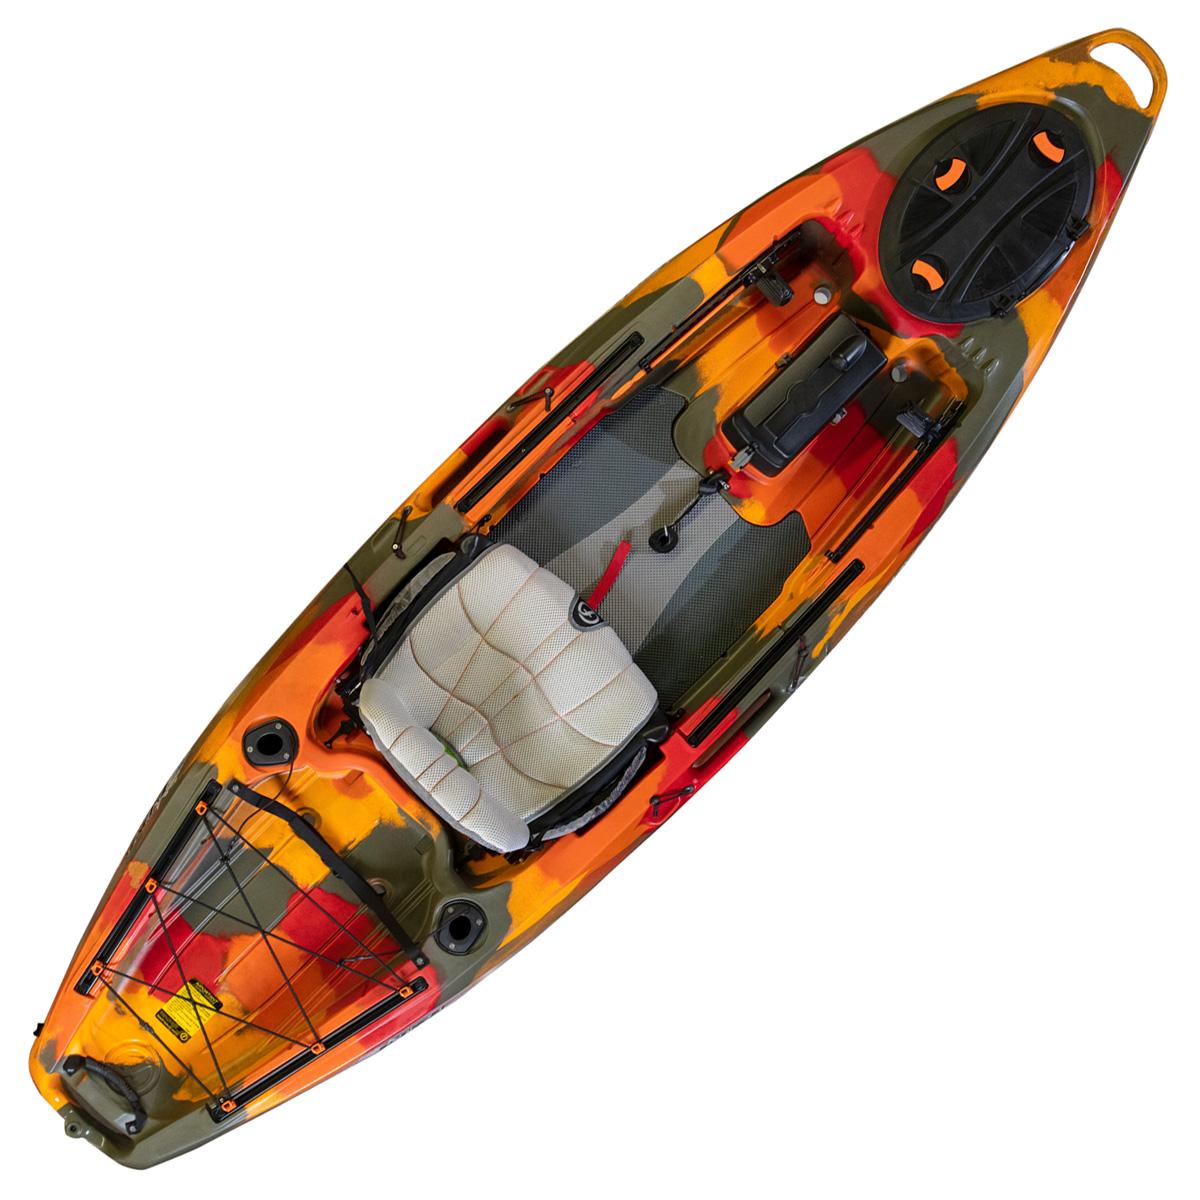 Feelfree Lure 10 Fishing Kayak Fire